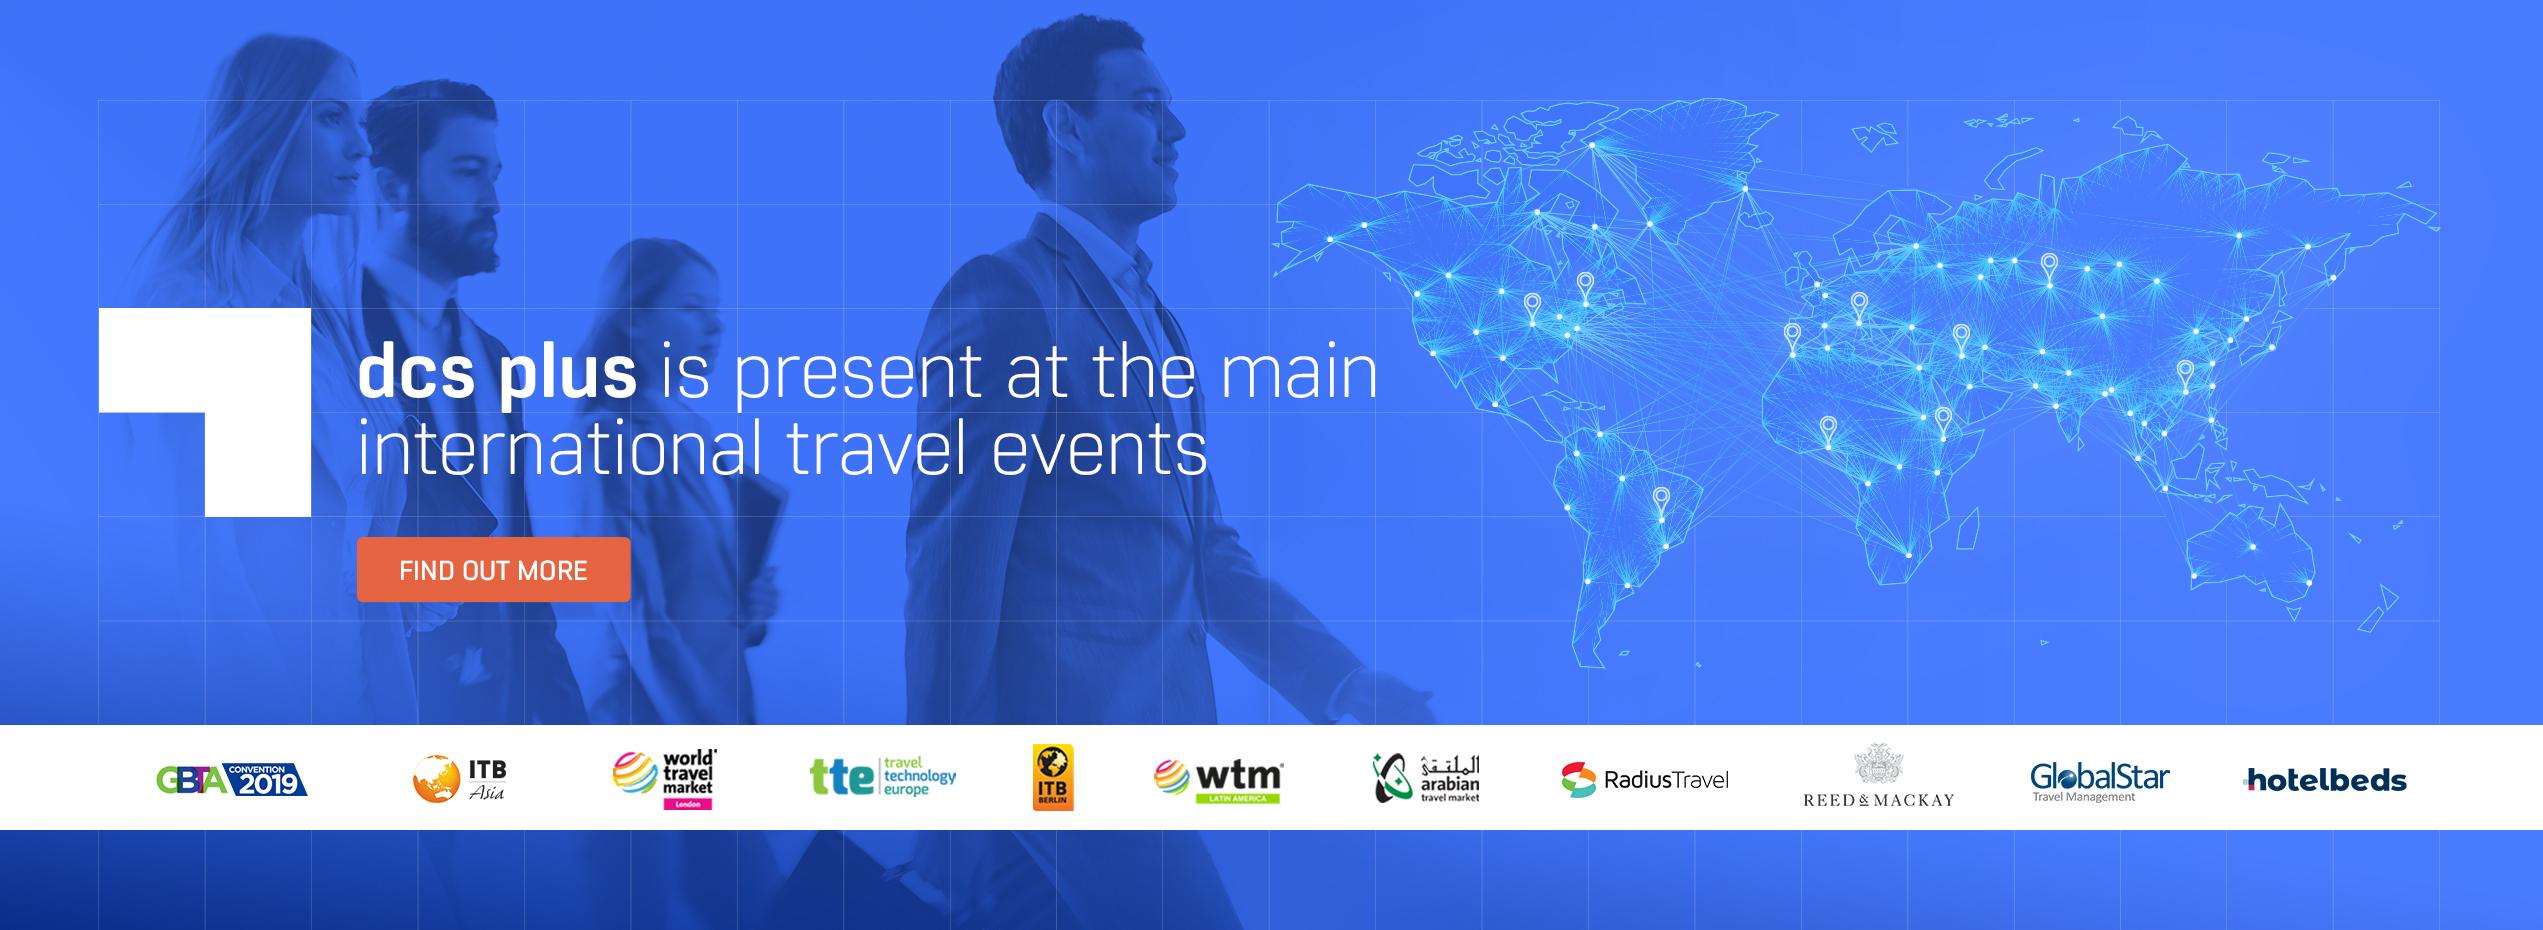 dcs plus presence at international events